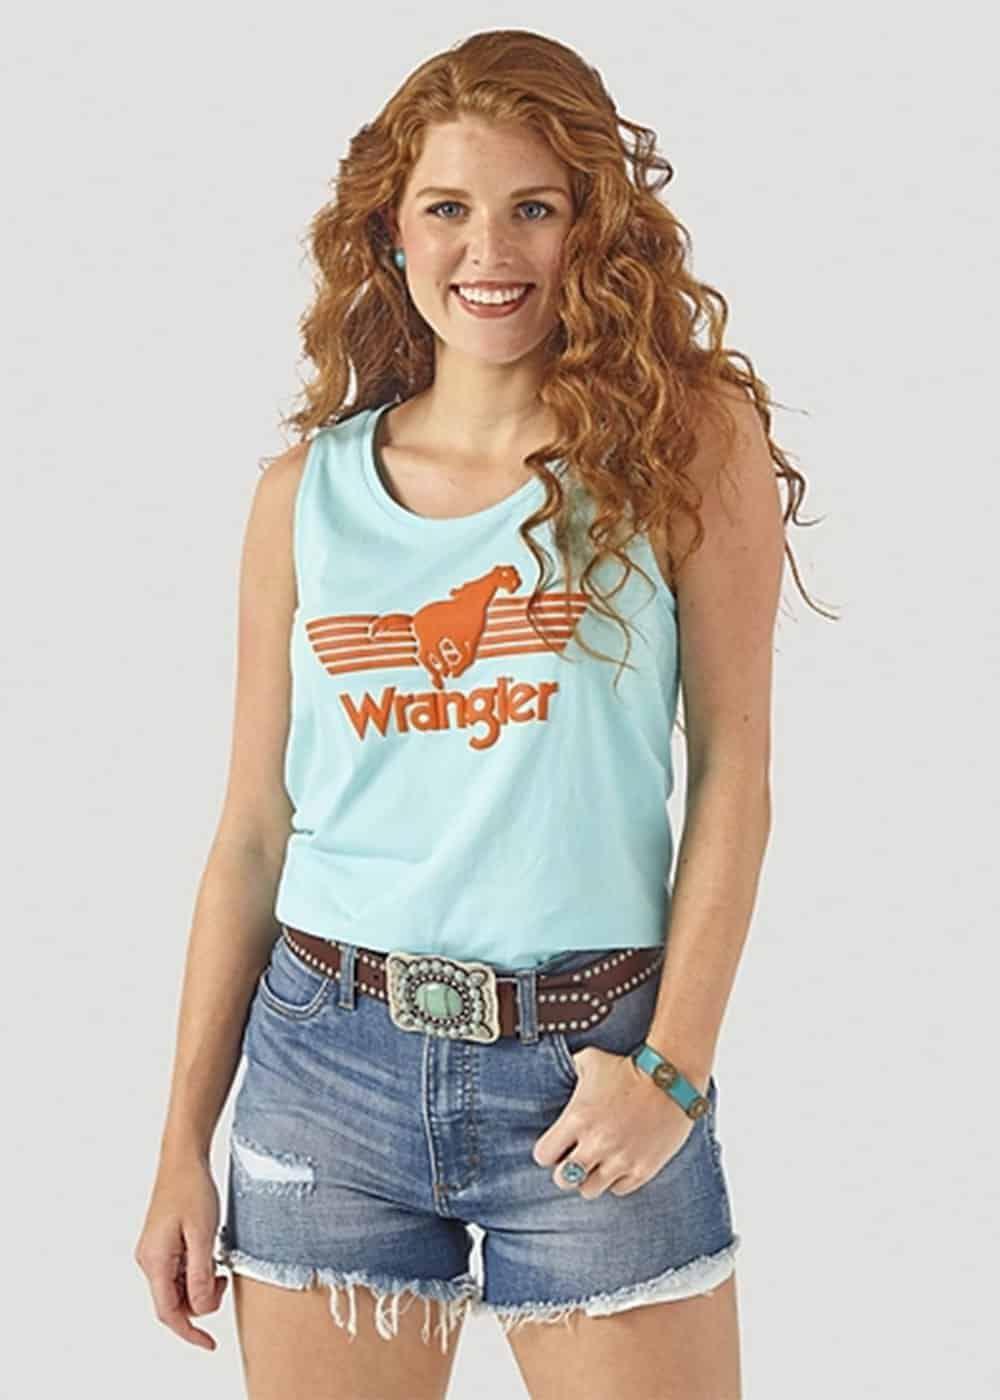 wrangler tank cowgirl magazine